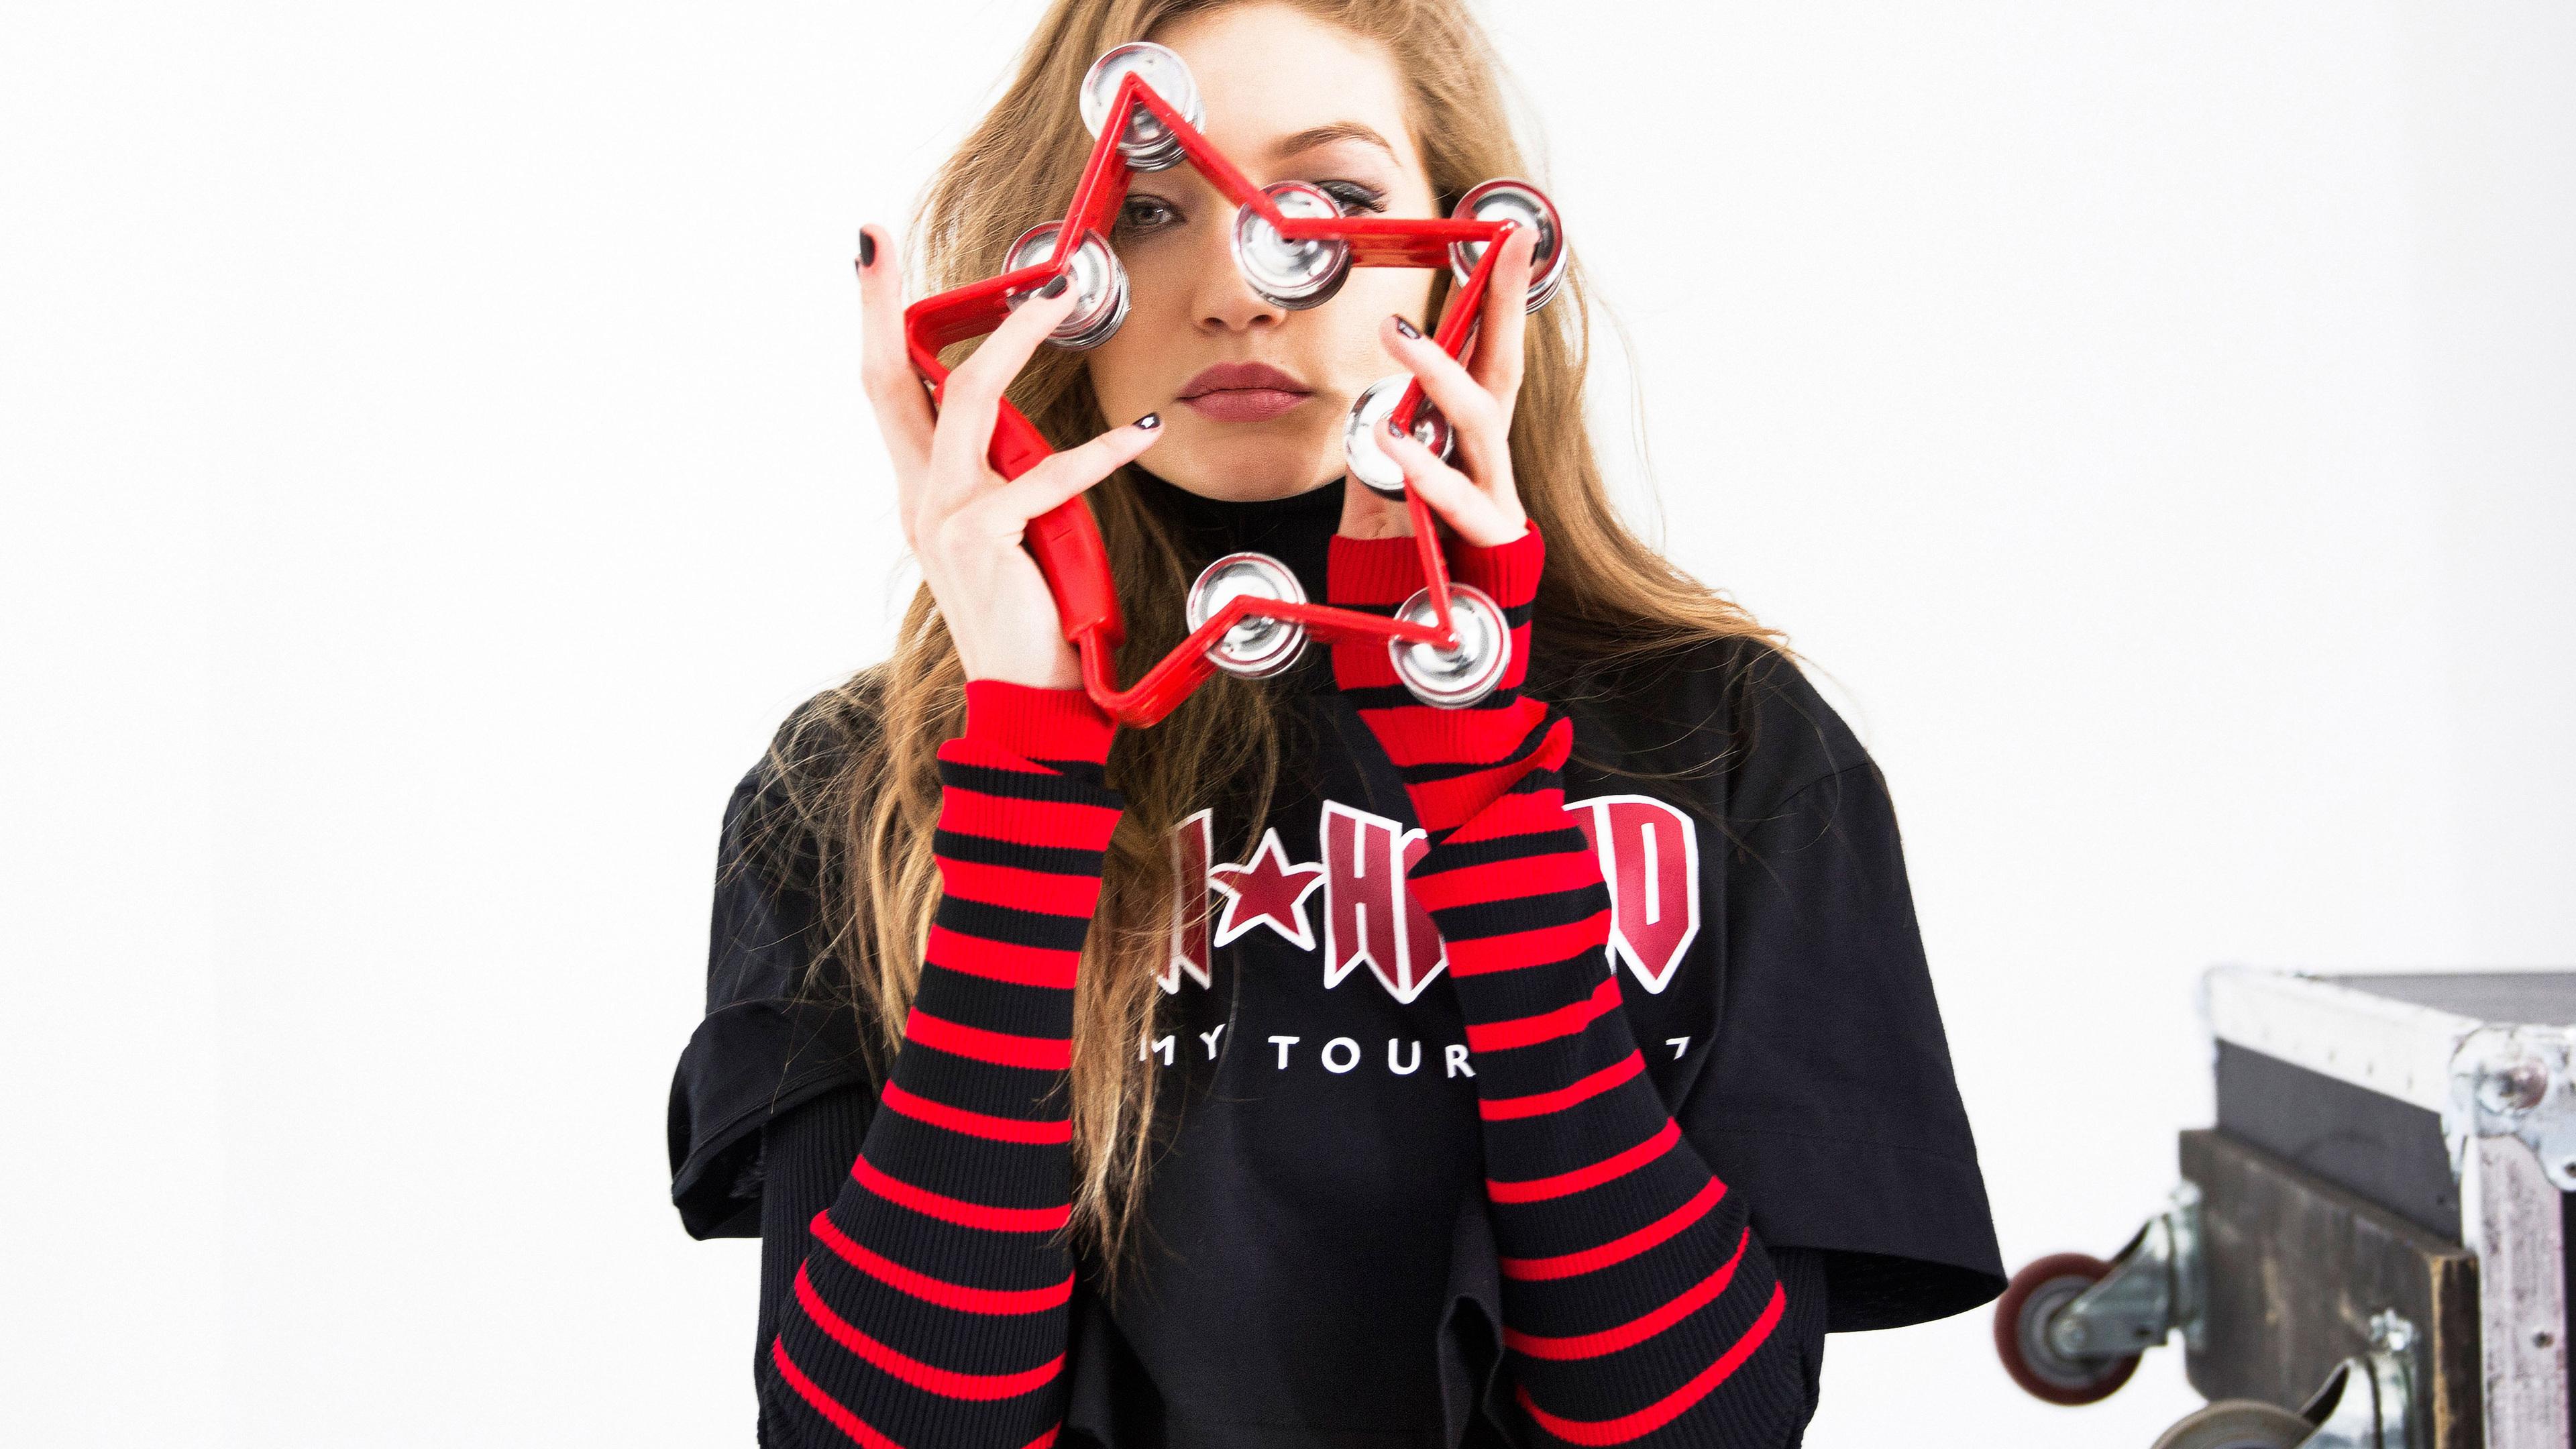 gigi hadid tommy x spring summer 2019 1536950232 - Gigi Hadid Tommy X Spring Summer 2019 - model wallpapers, hd-wallpapers, girls wallpapers, gigi hadid wallpapers, celebrities wallpapers, 5k wallpapers, 4k-wallpapers